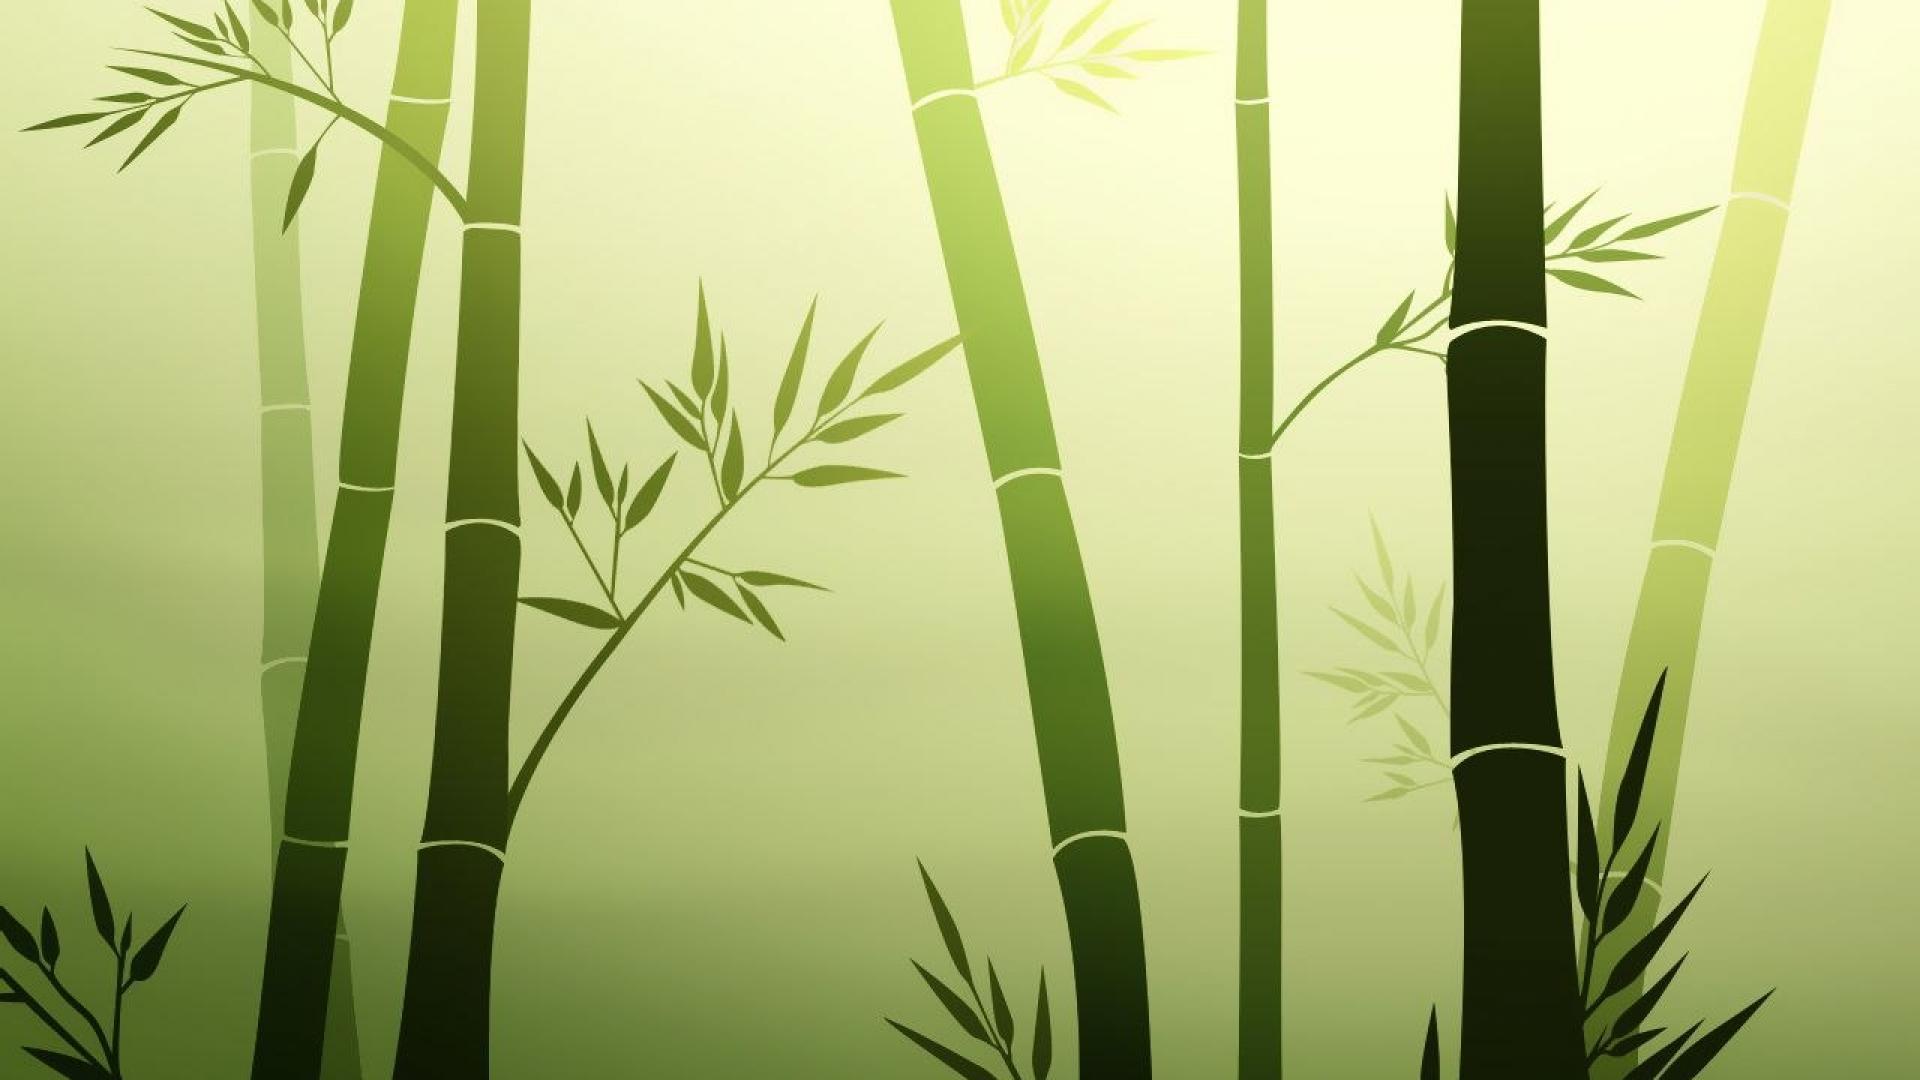 Wallpaper Category : Fantasy HD resolutions (16:9): 1366x768 1600x900 1920x1080